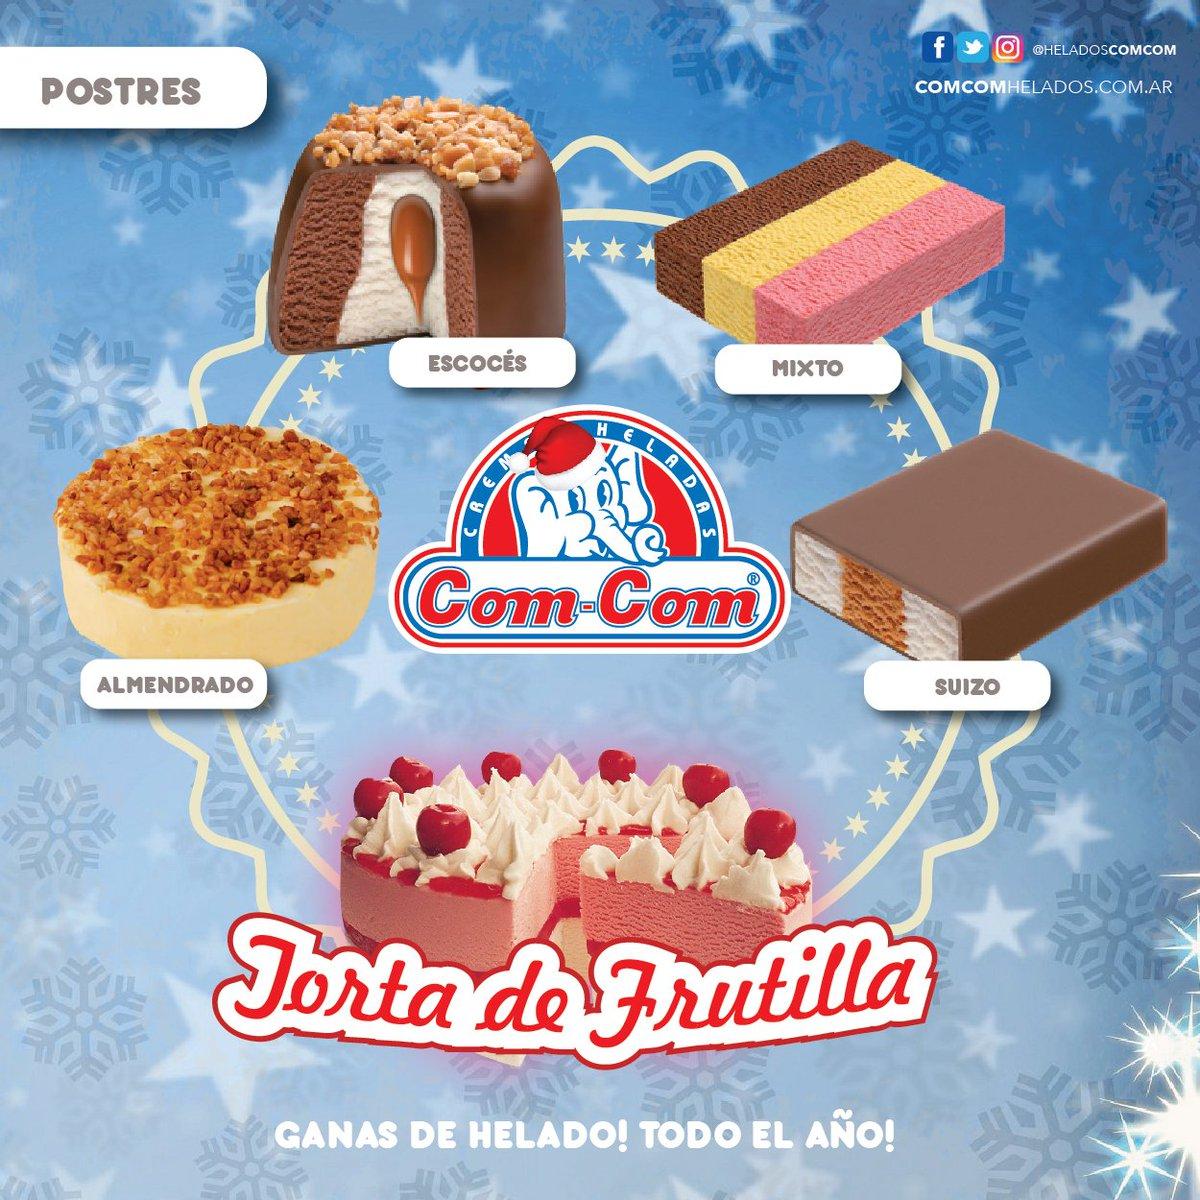 Postres Para Una Feliz Navidad.Helados Com Com On Twitter Compra Los Mejores Postres